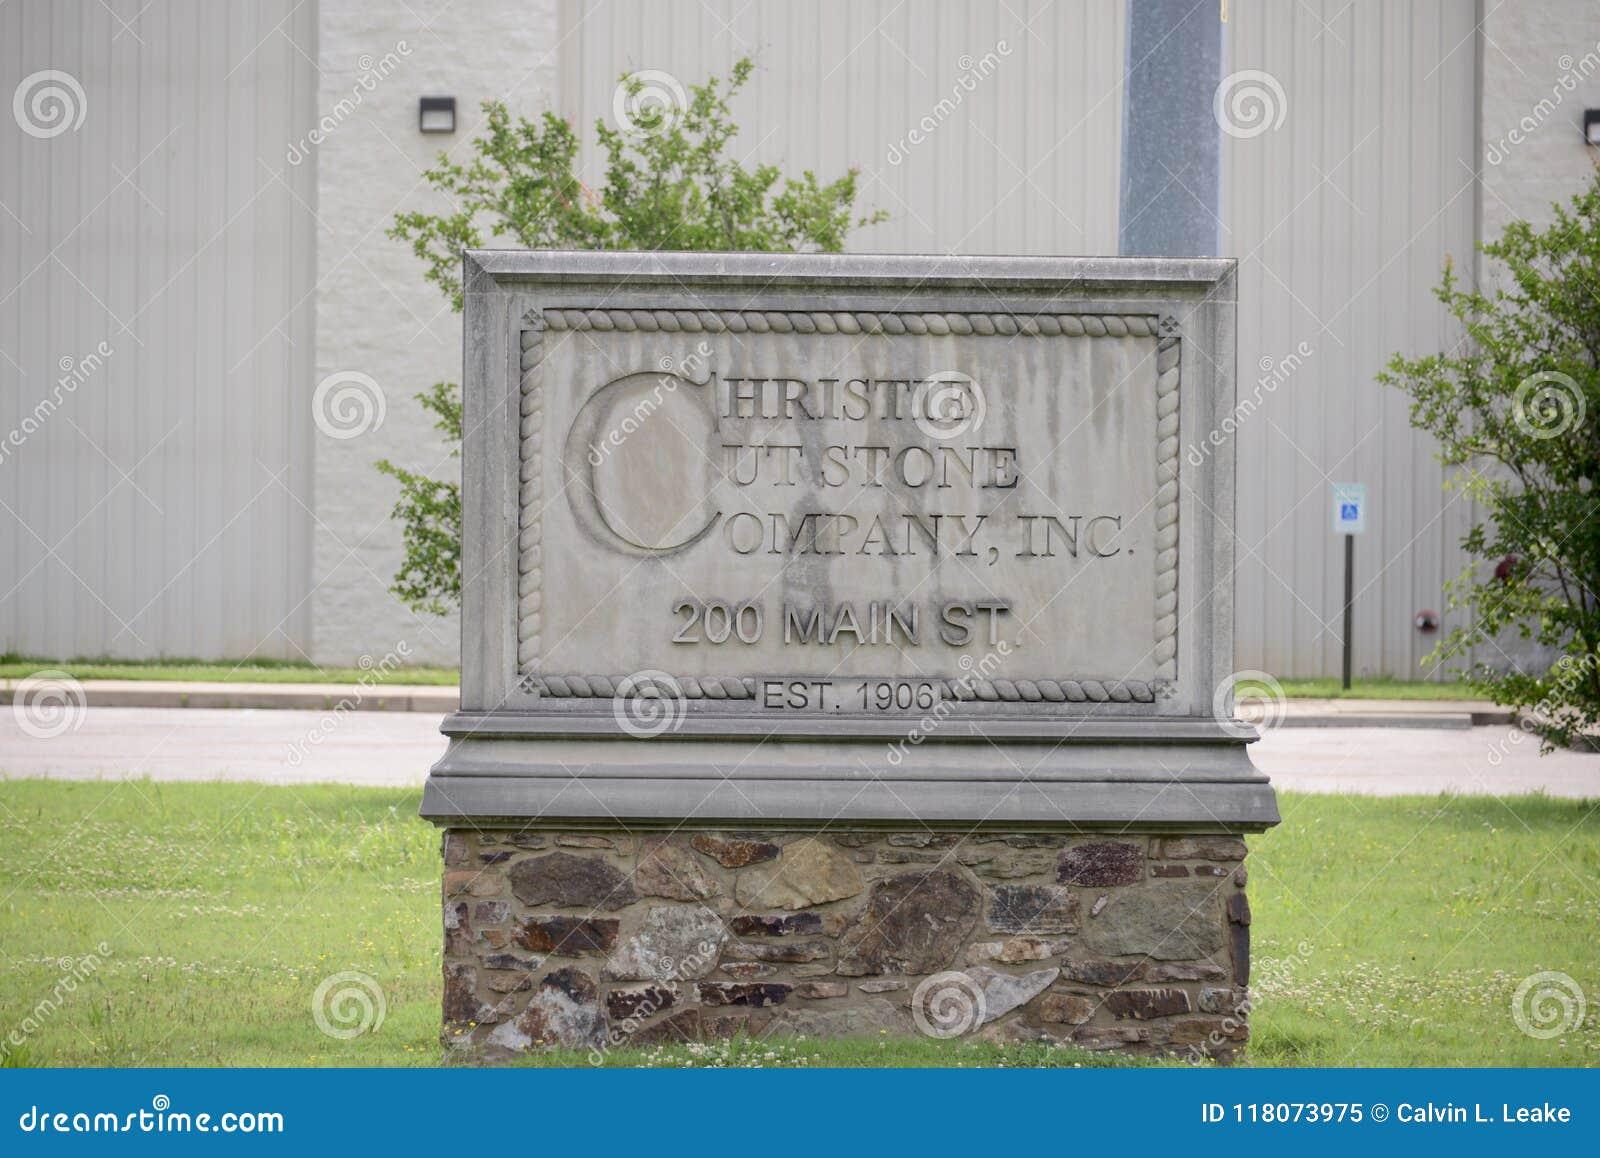 Камень отрезка Christie, Inc